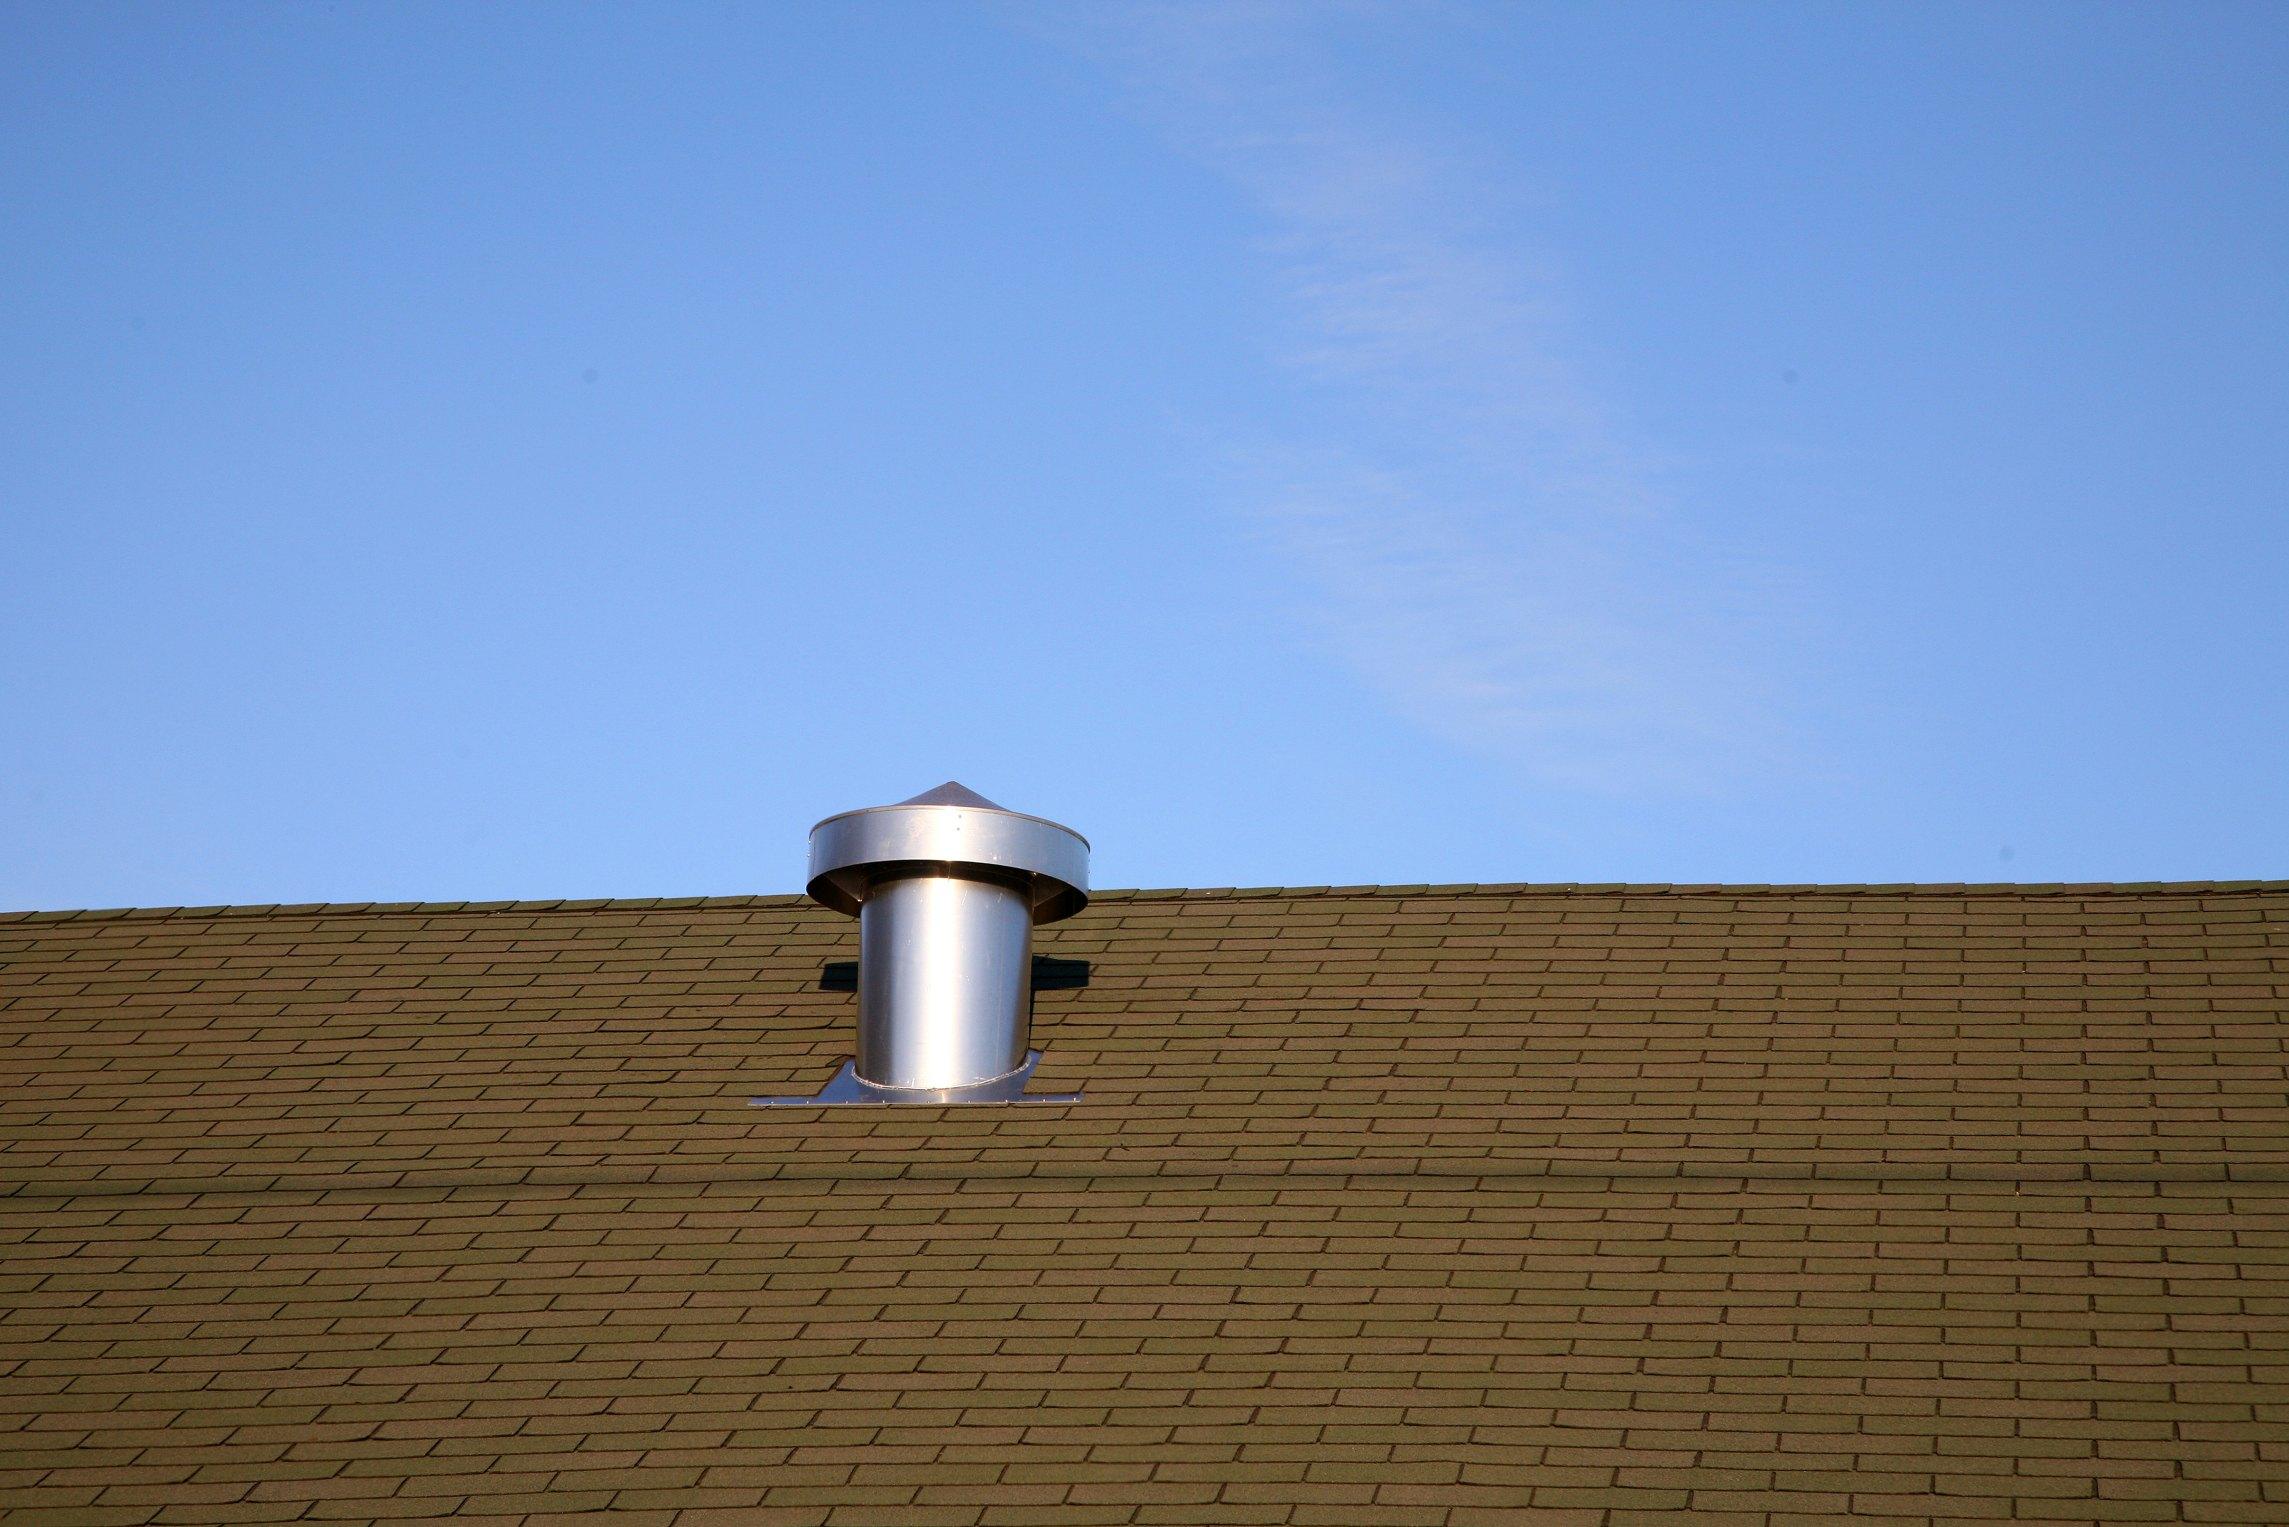 Will A Roof Mounted Wind Turbine Help Ventilate My Attic